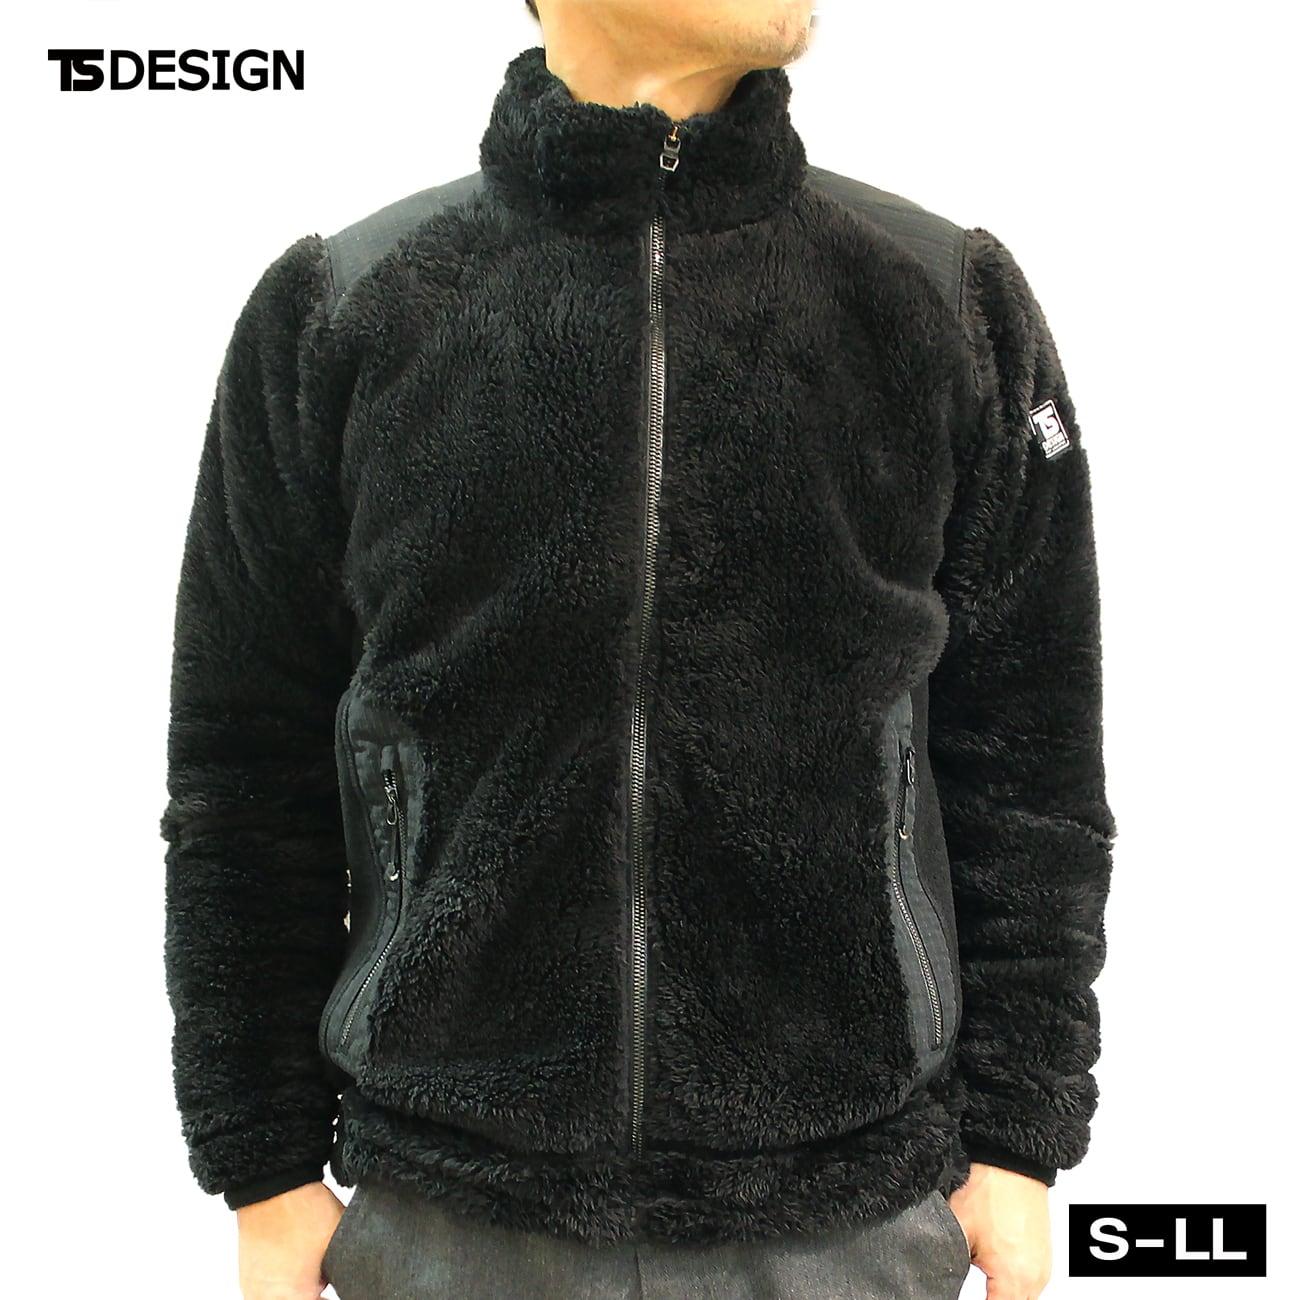 TS DESIGN TS DELTA Bulky fleece Jacket S-LL